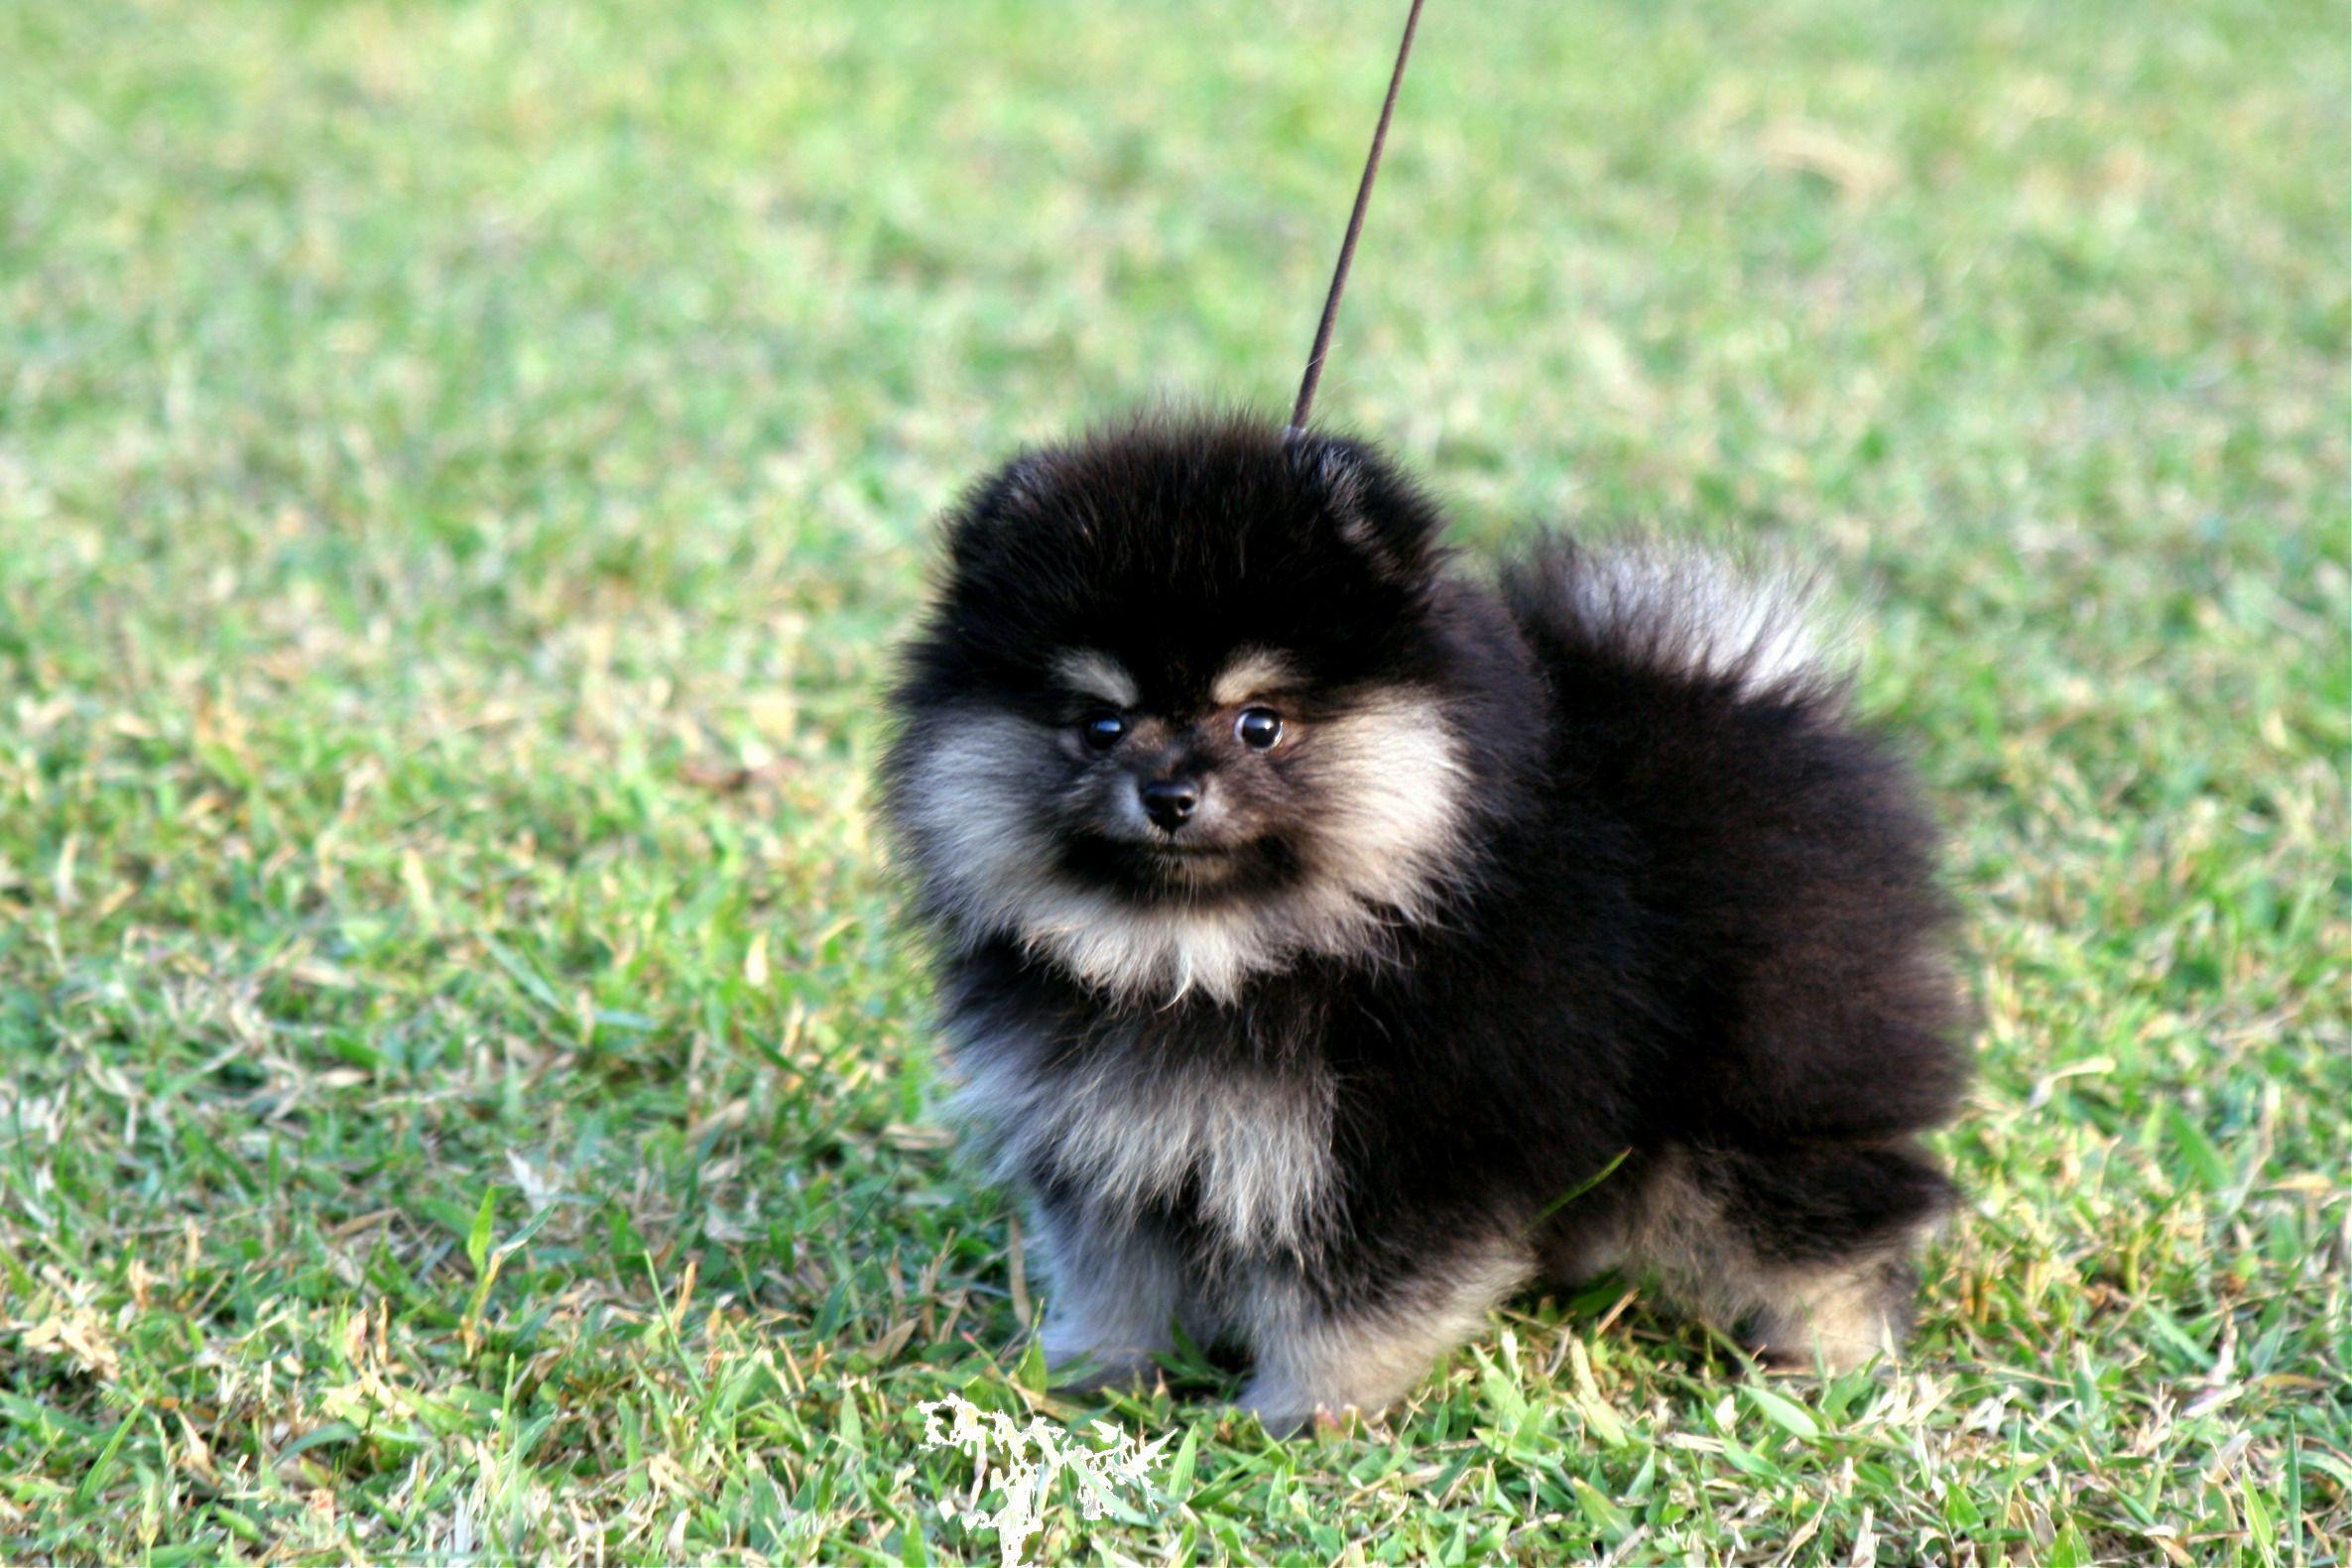 Pomeranian Black Tan Pomeranian Female Age Of 2 Months